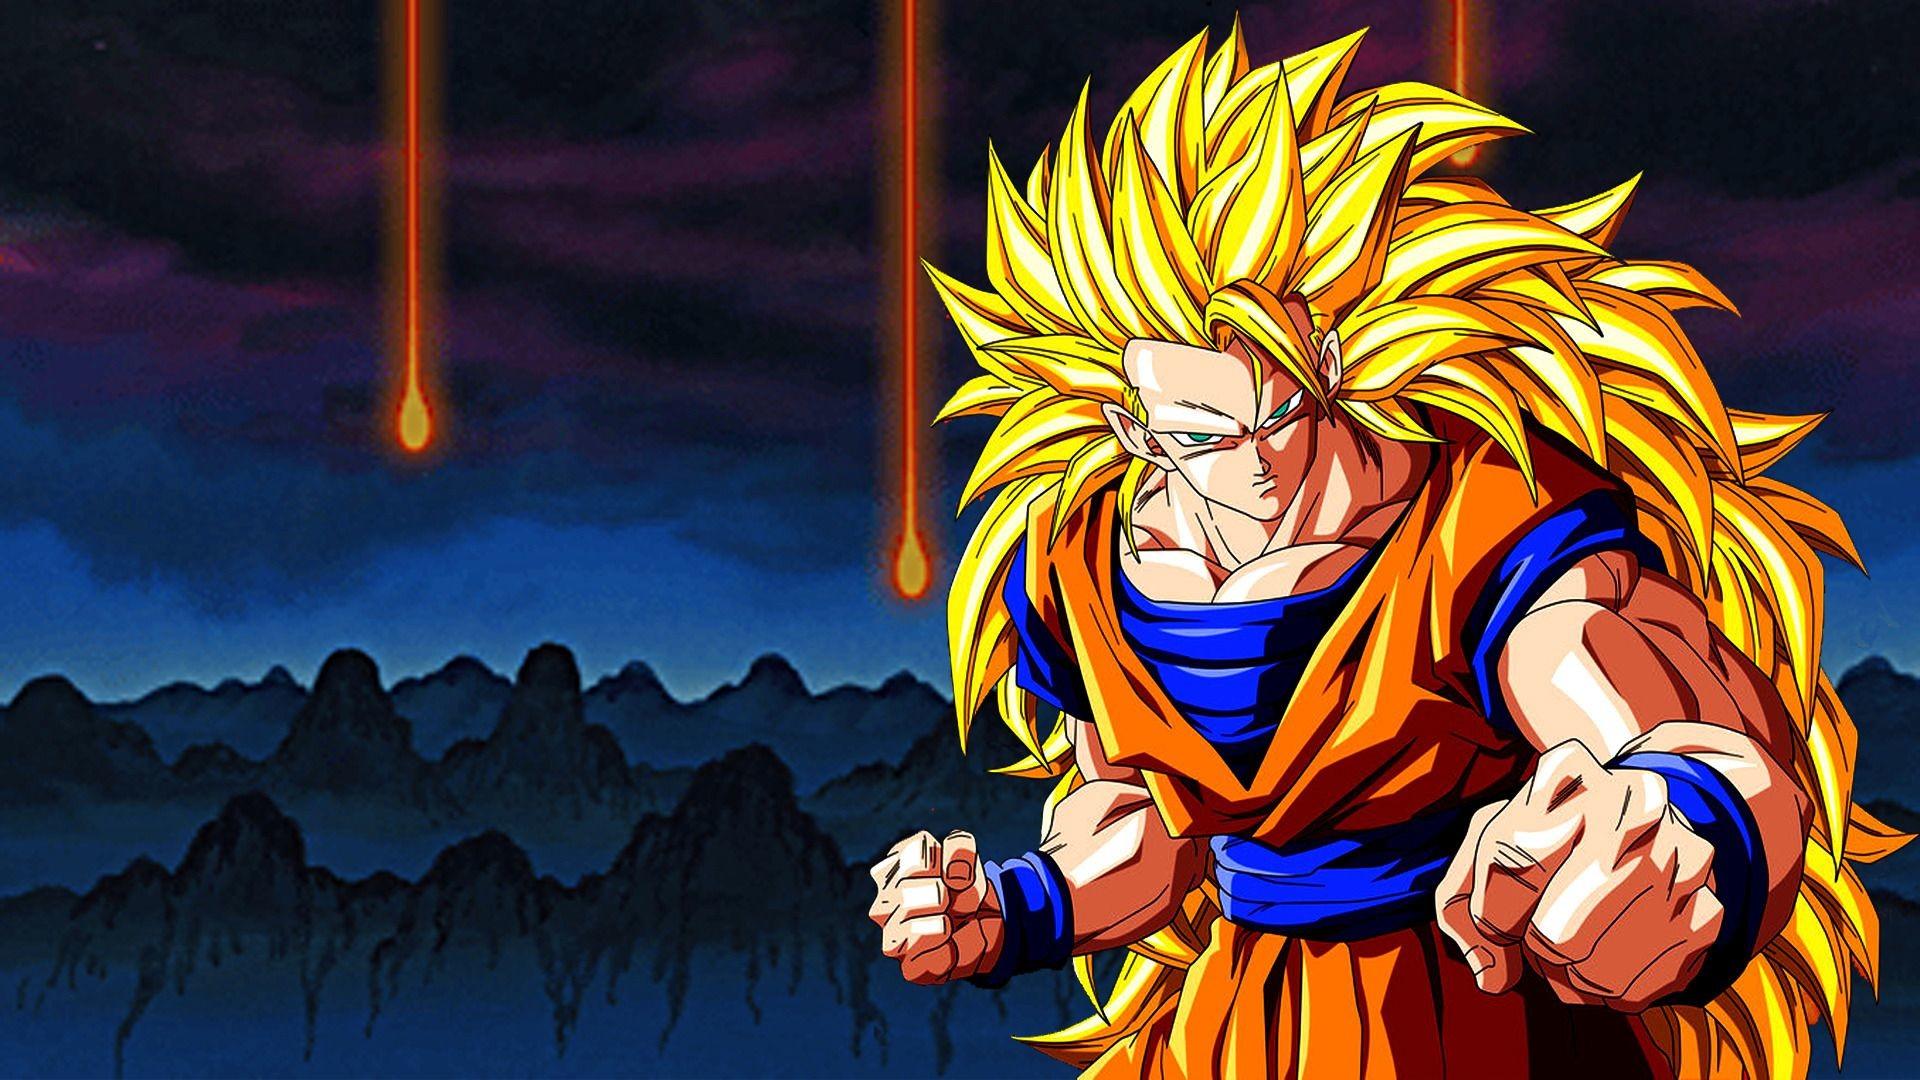 HD Goku Super Saiyan 3 Dragon Ball Z Wallpaper Full Size .